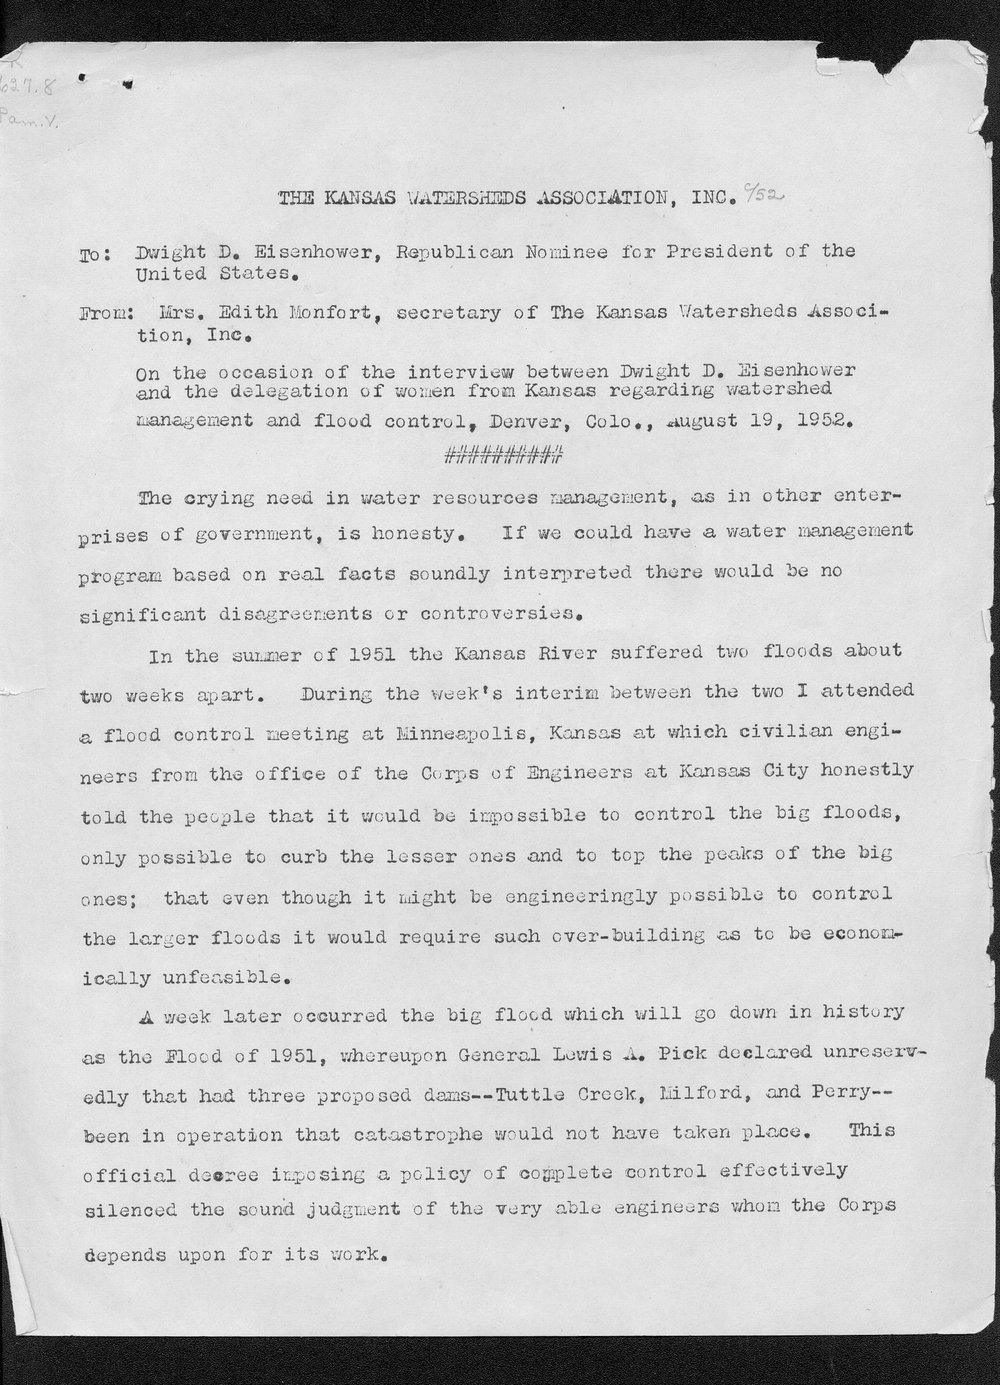 Edith Monfort to Dwight Eisenhower - 1